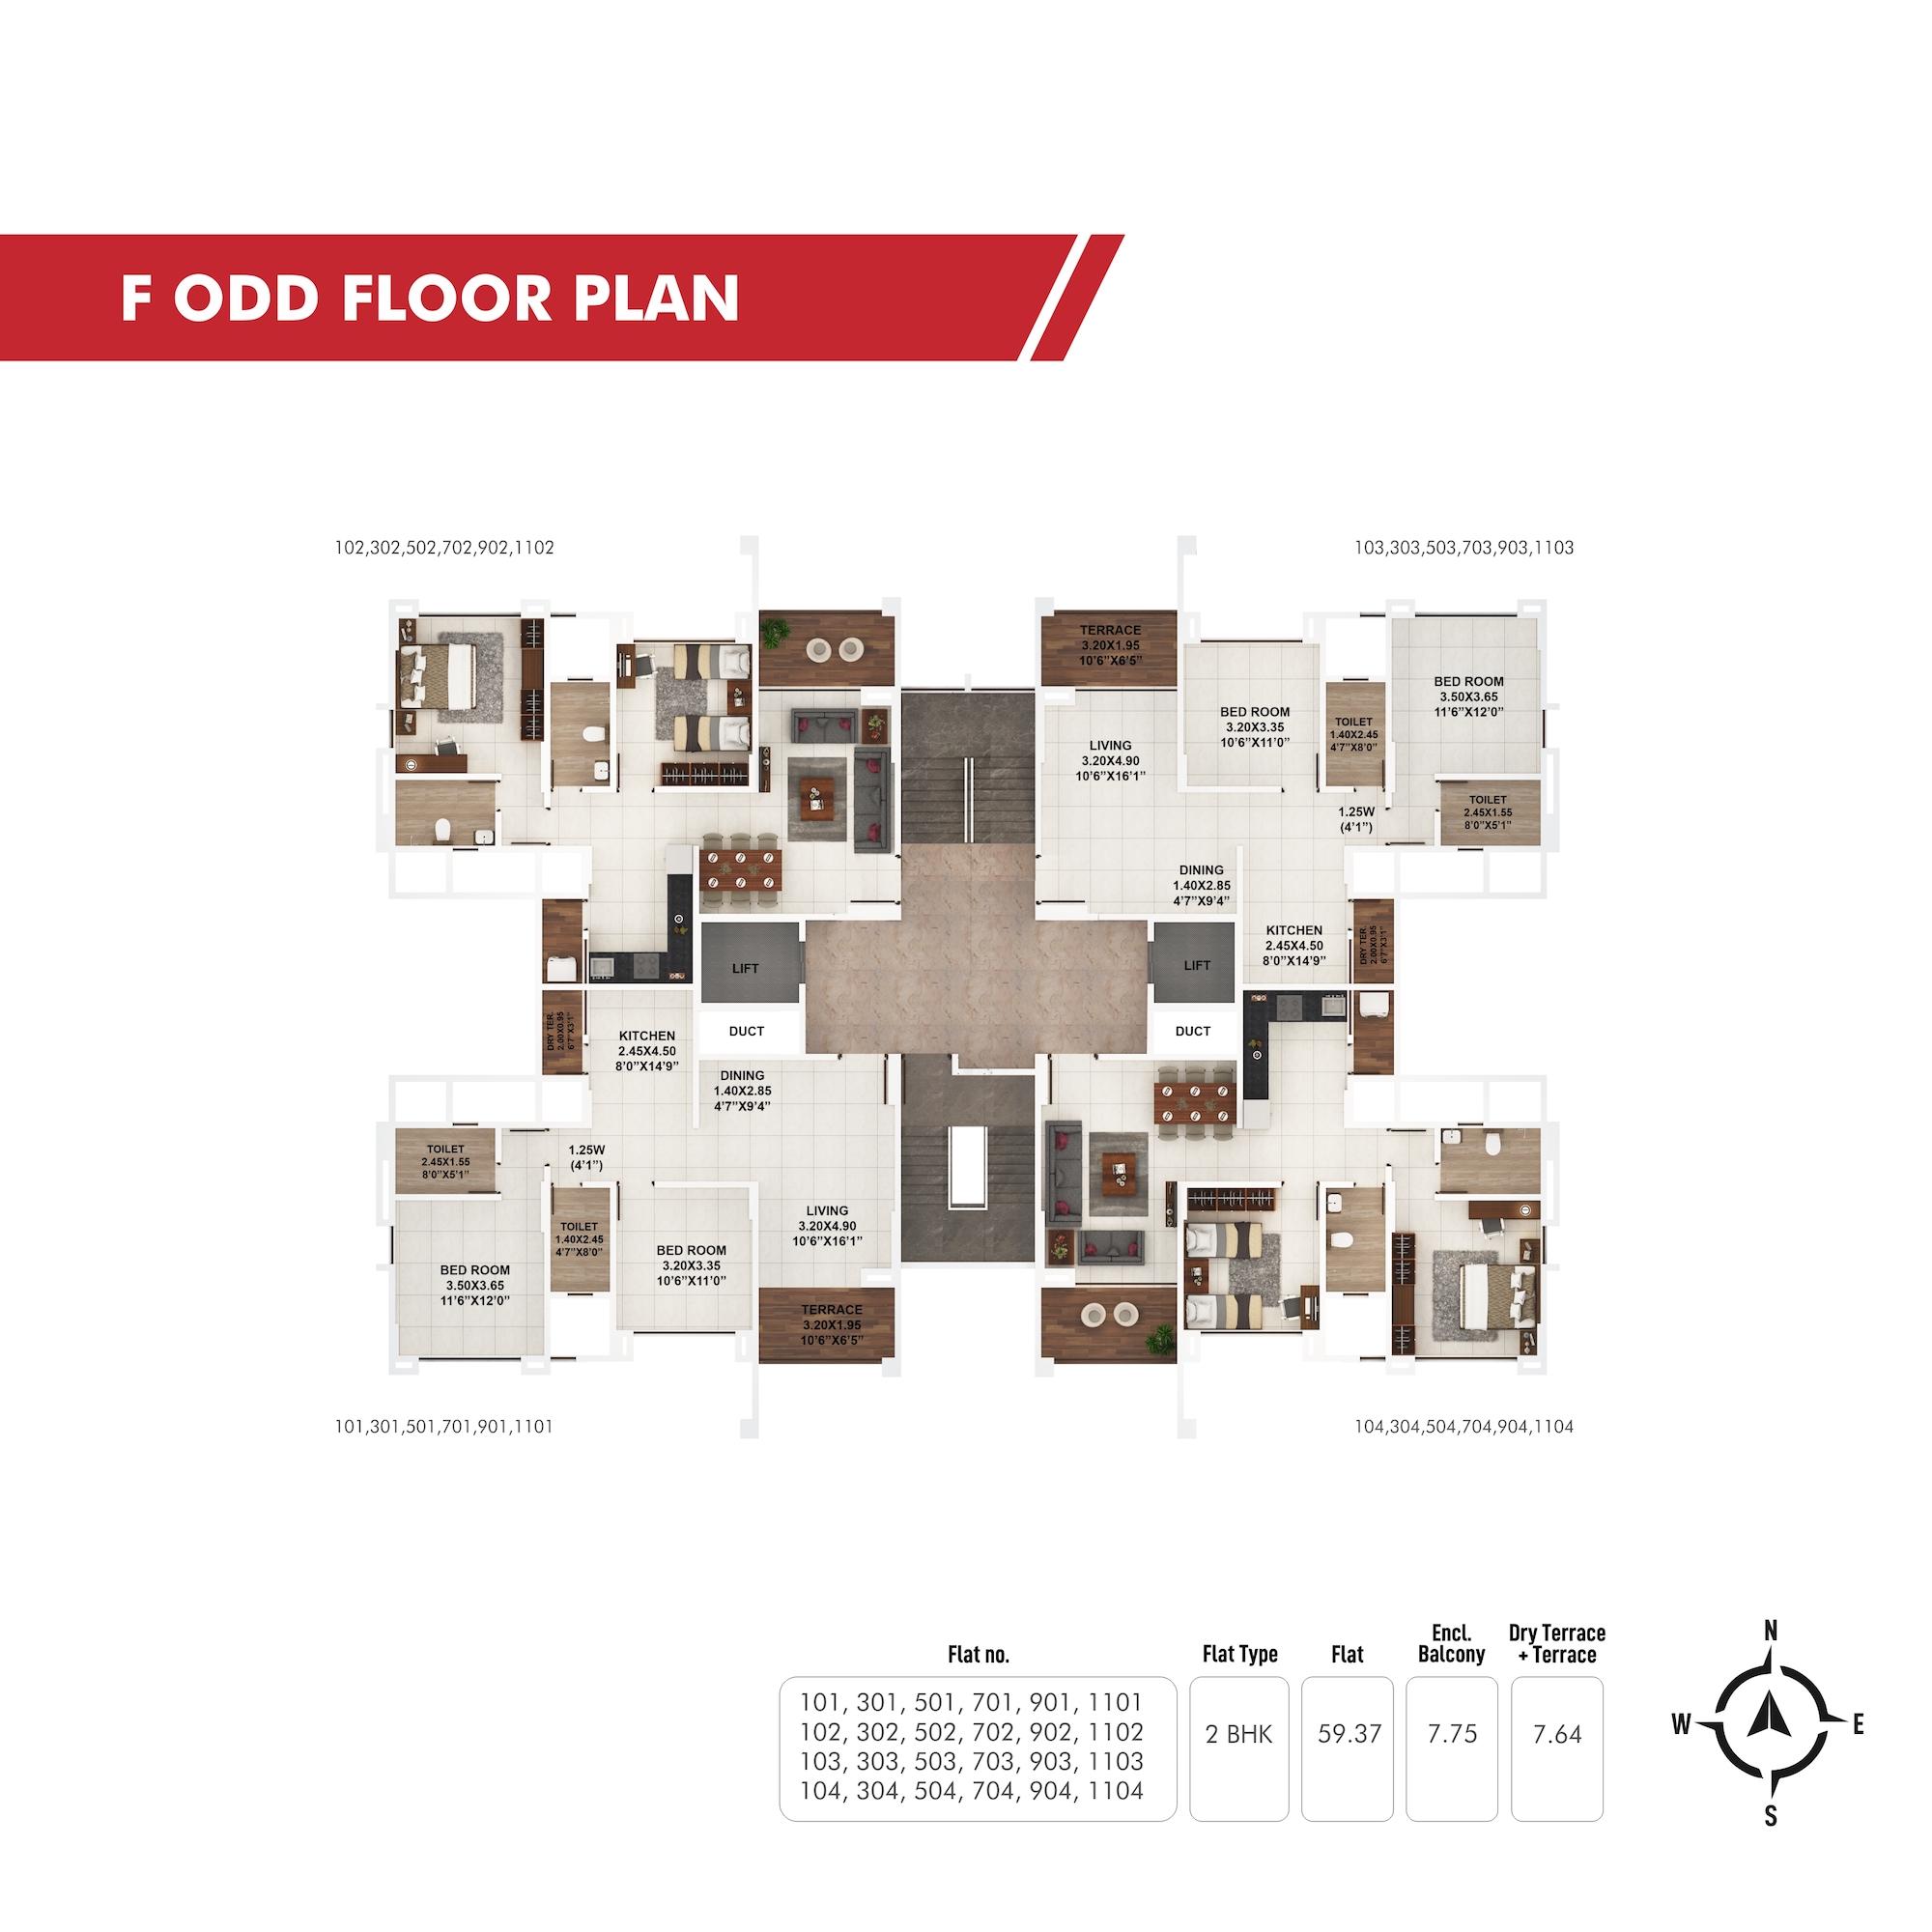 Piccadilly F Odd Floor Plan